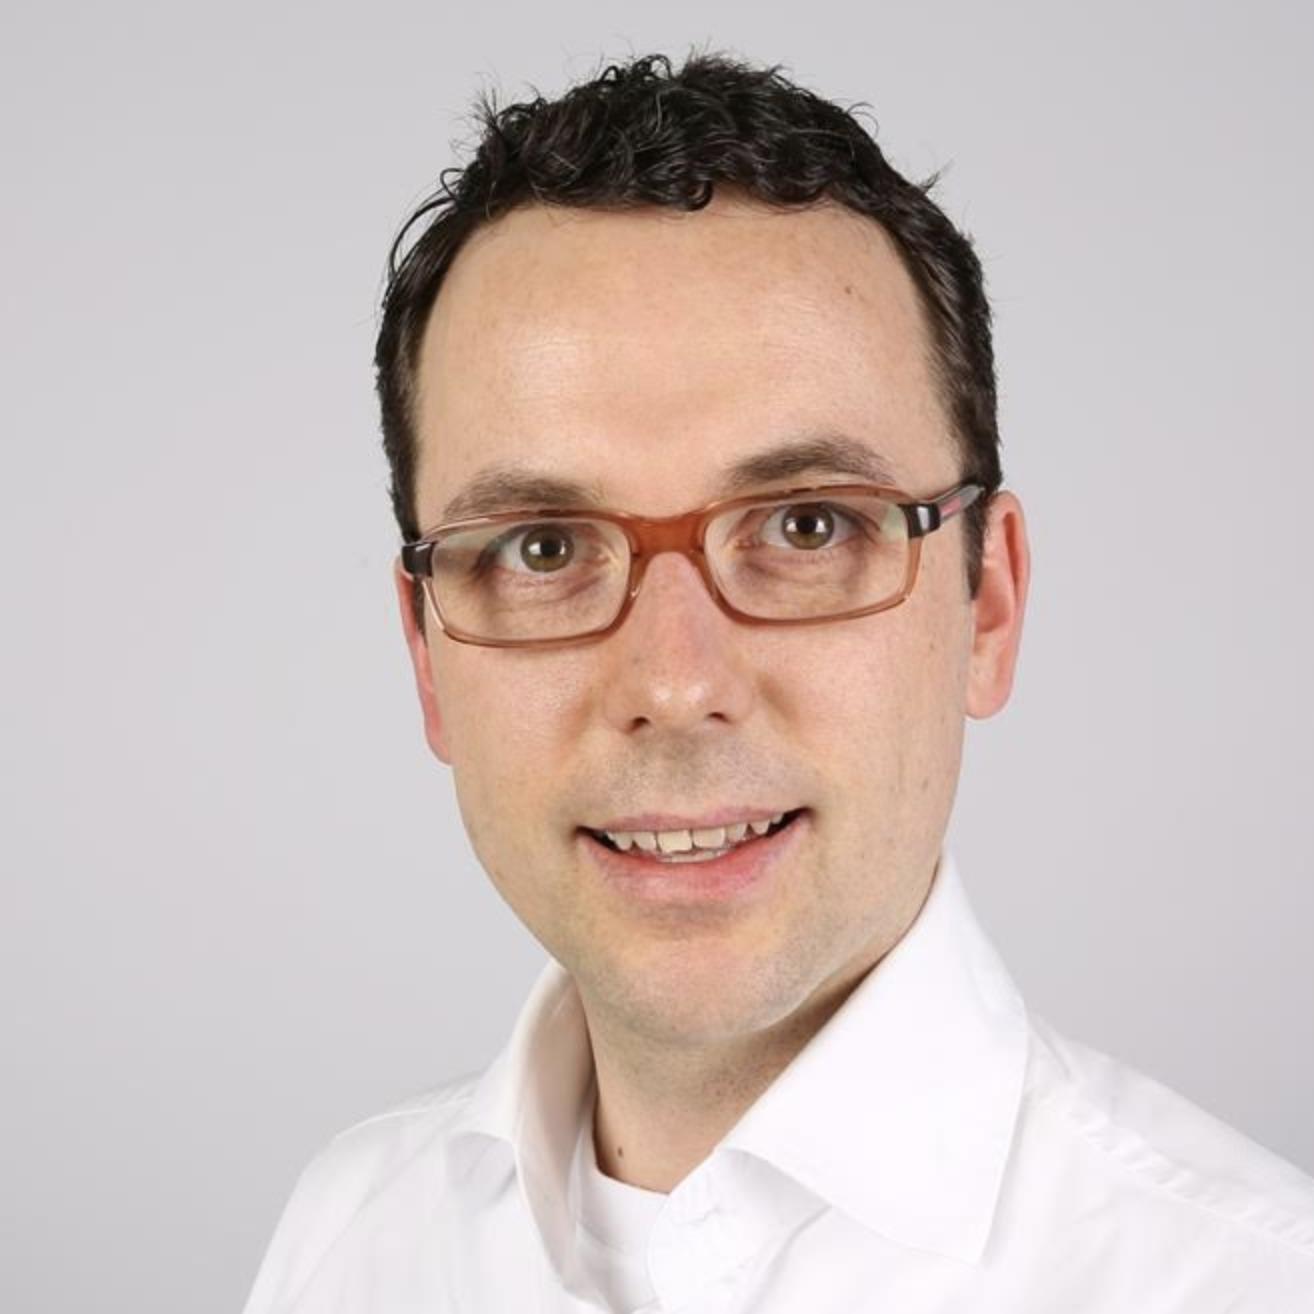 Dr. Mathias Onischka